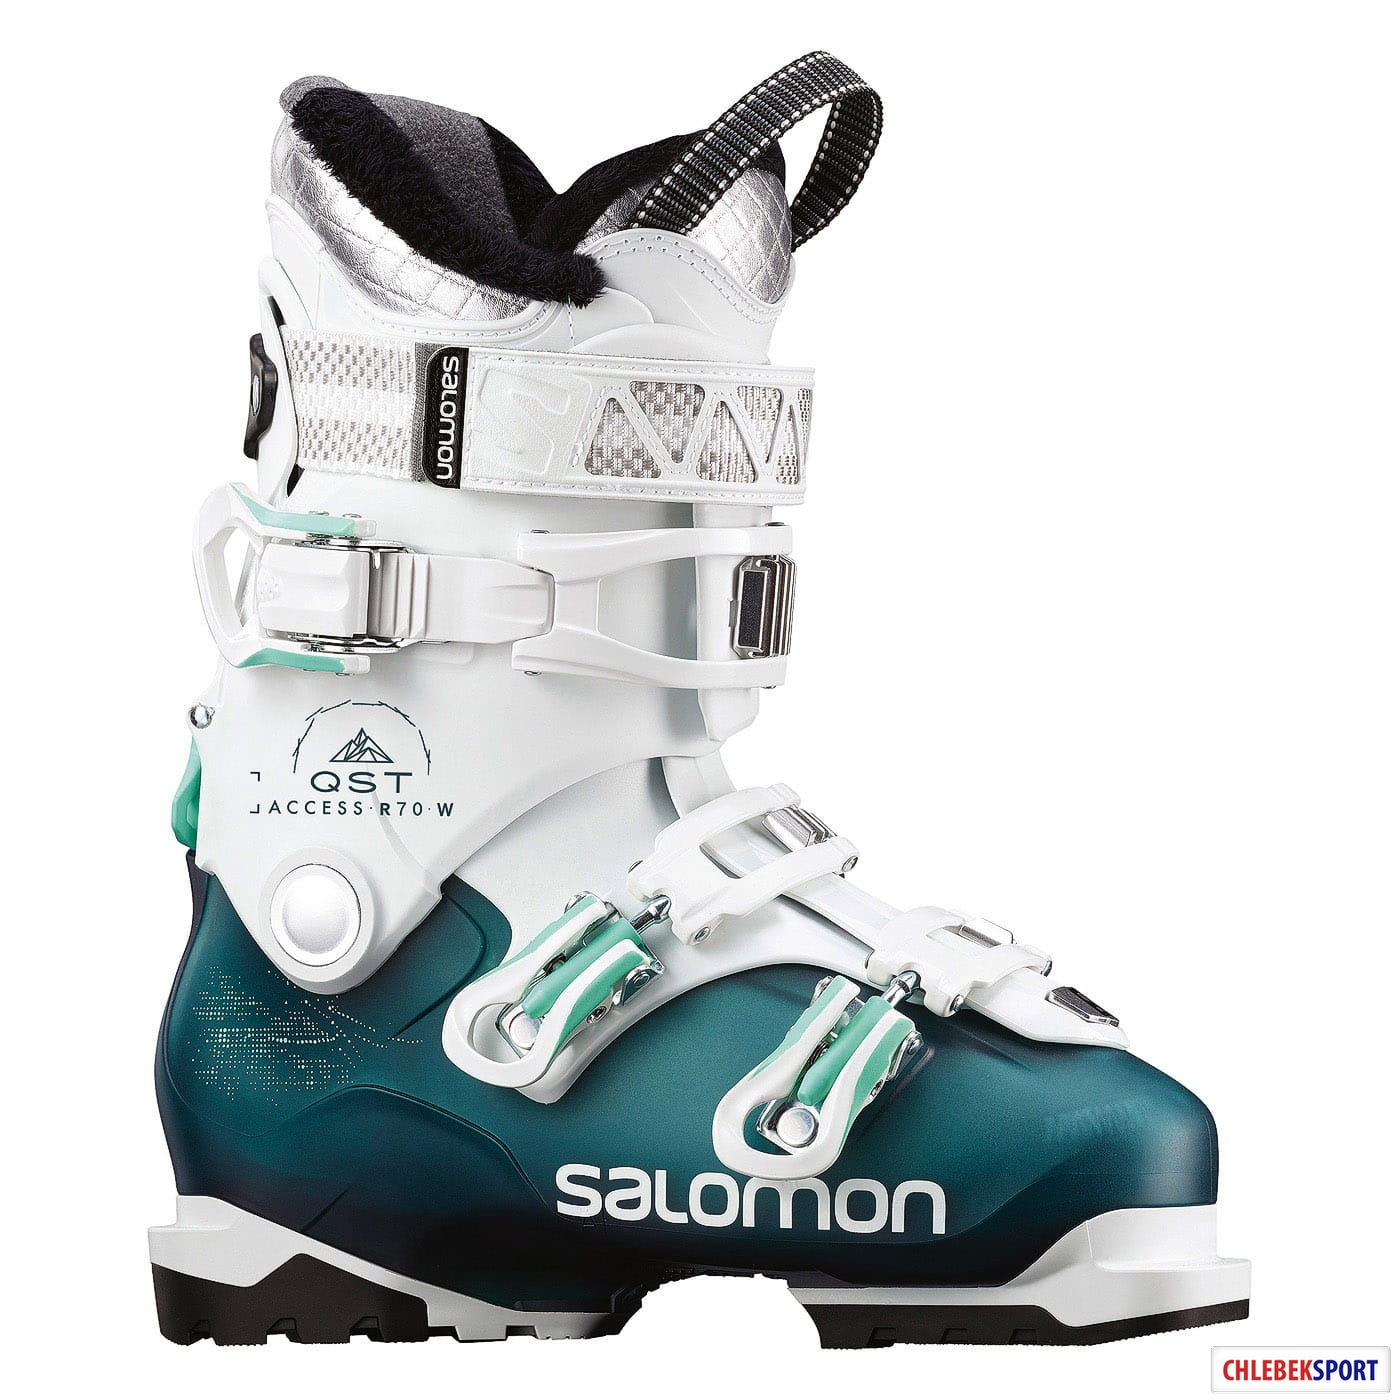 Buty narciarskie Salomon Quest Access R70 W 2019 [bn138]